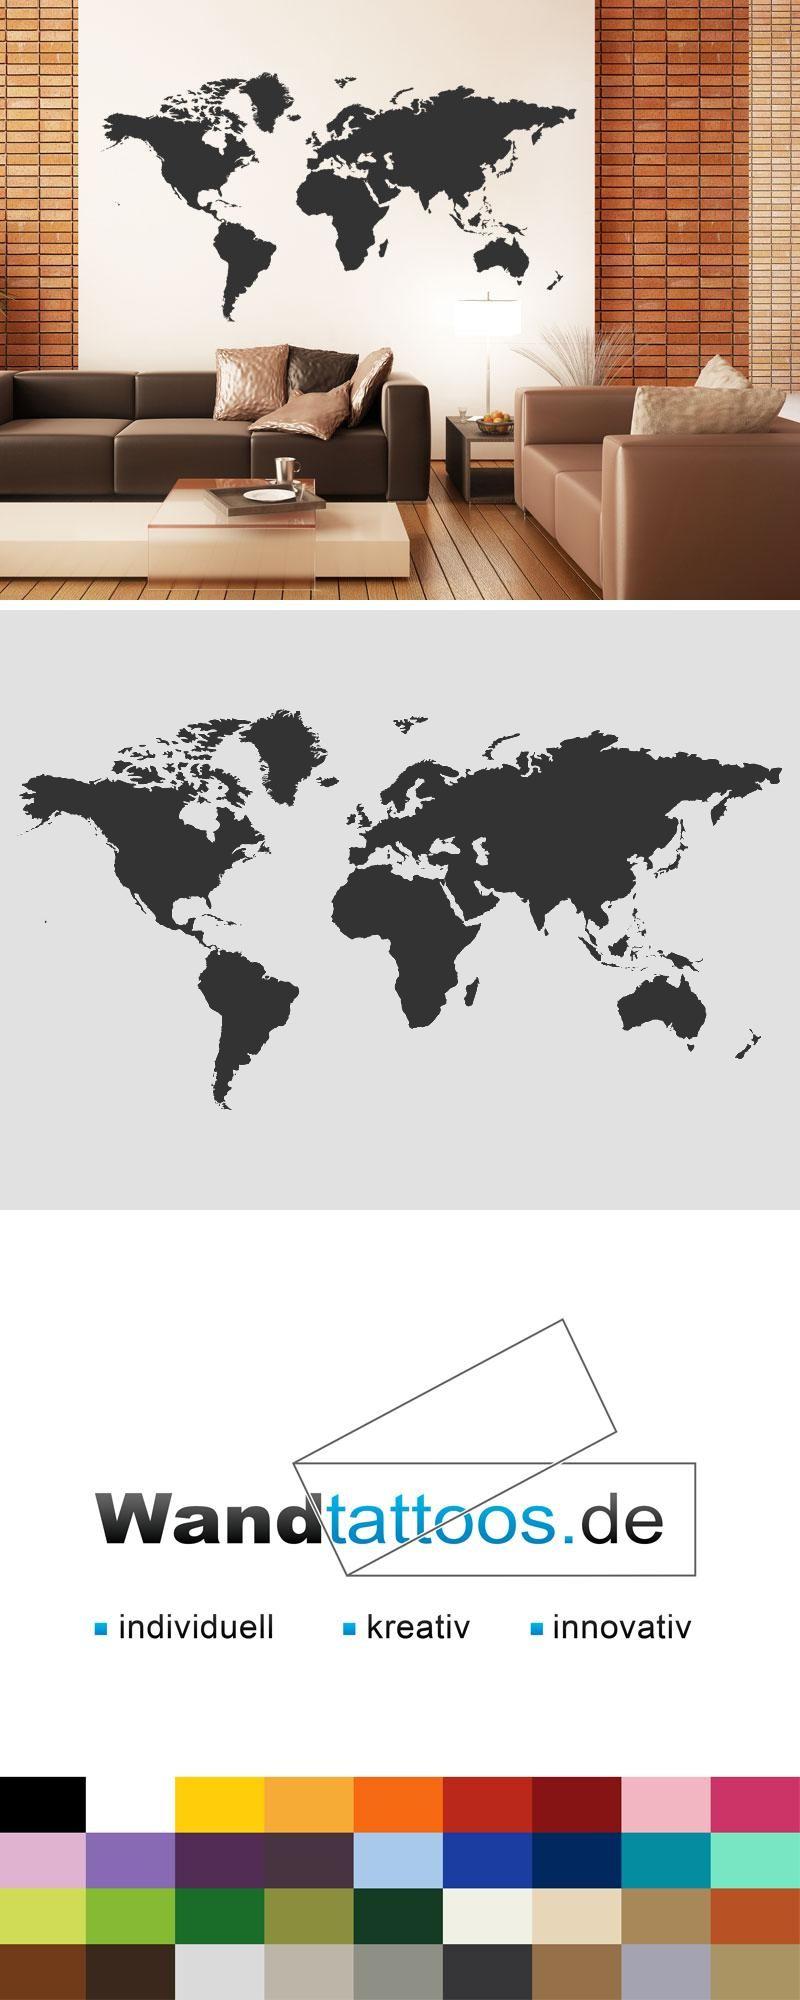 Bemerkenswert Wandtattoo Weltkarte Galerie Von - Wandtattoos.de